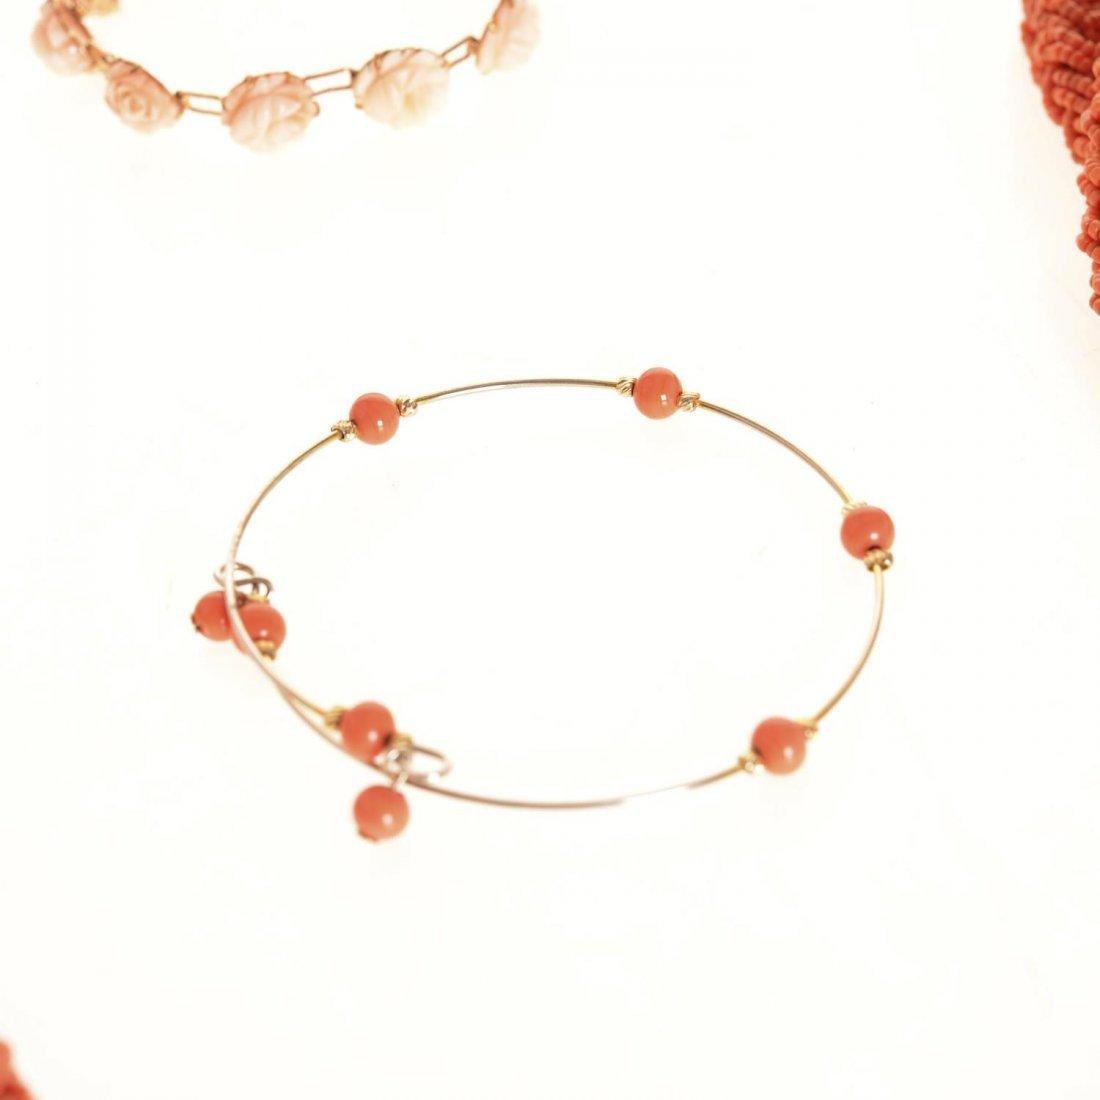 (4) pcs. Antique coral jewelry - 5